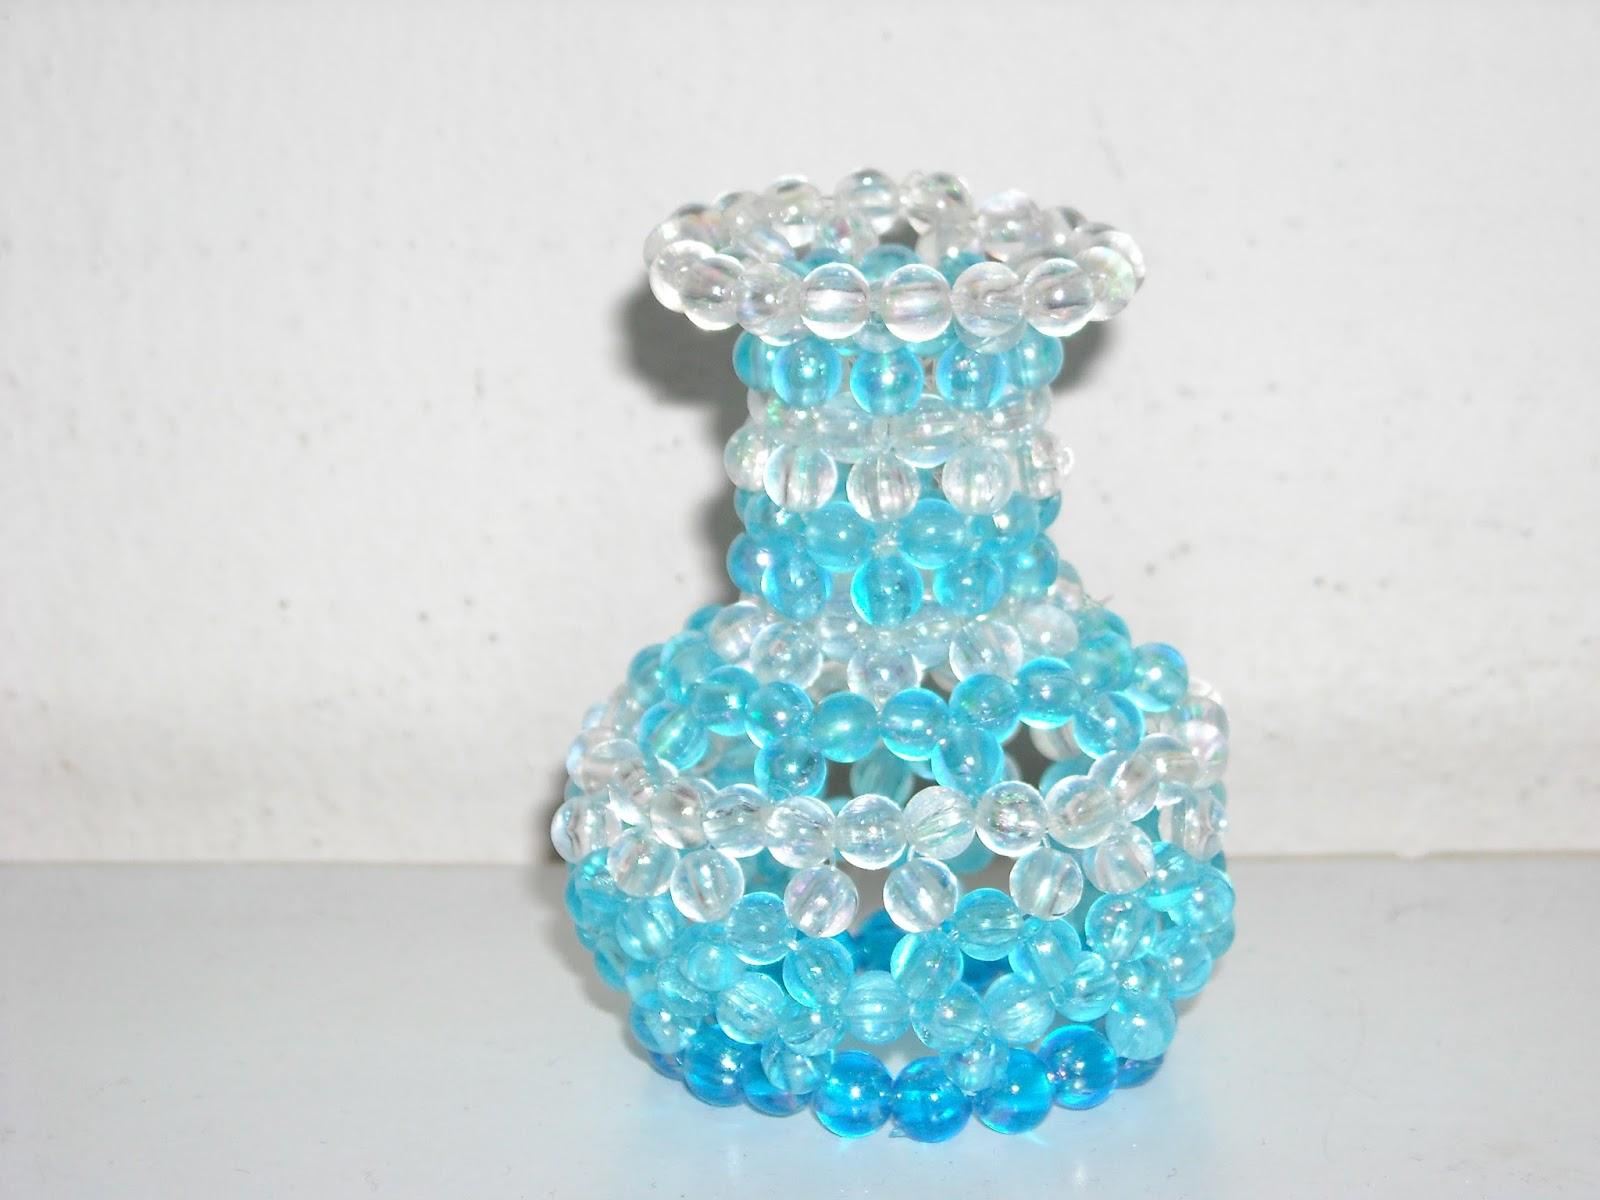 My craftwork collection & My craftwork collection: My DIY beaded flower vase